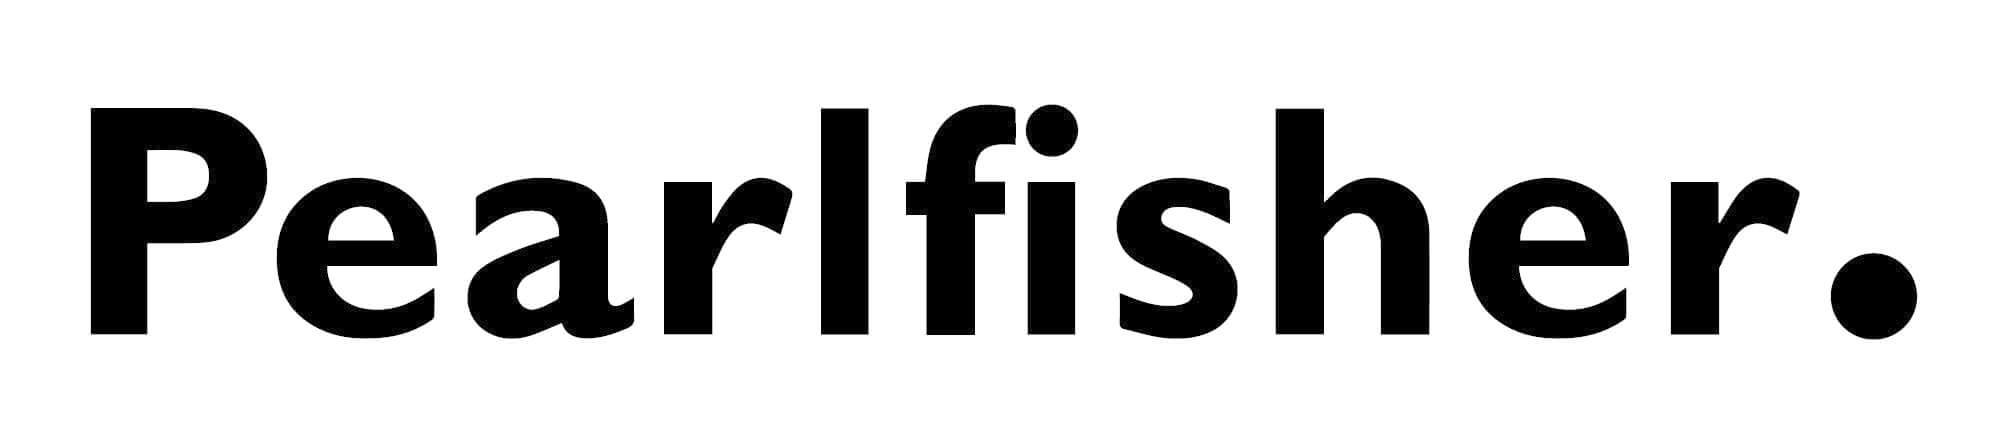 Pearlfisher logo